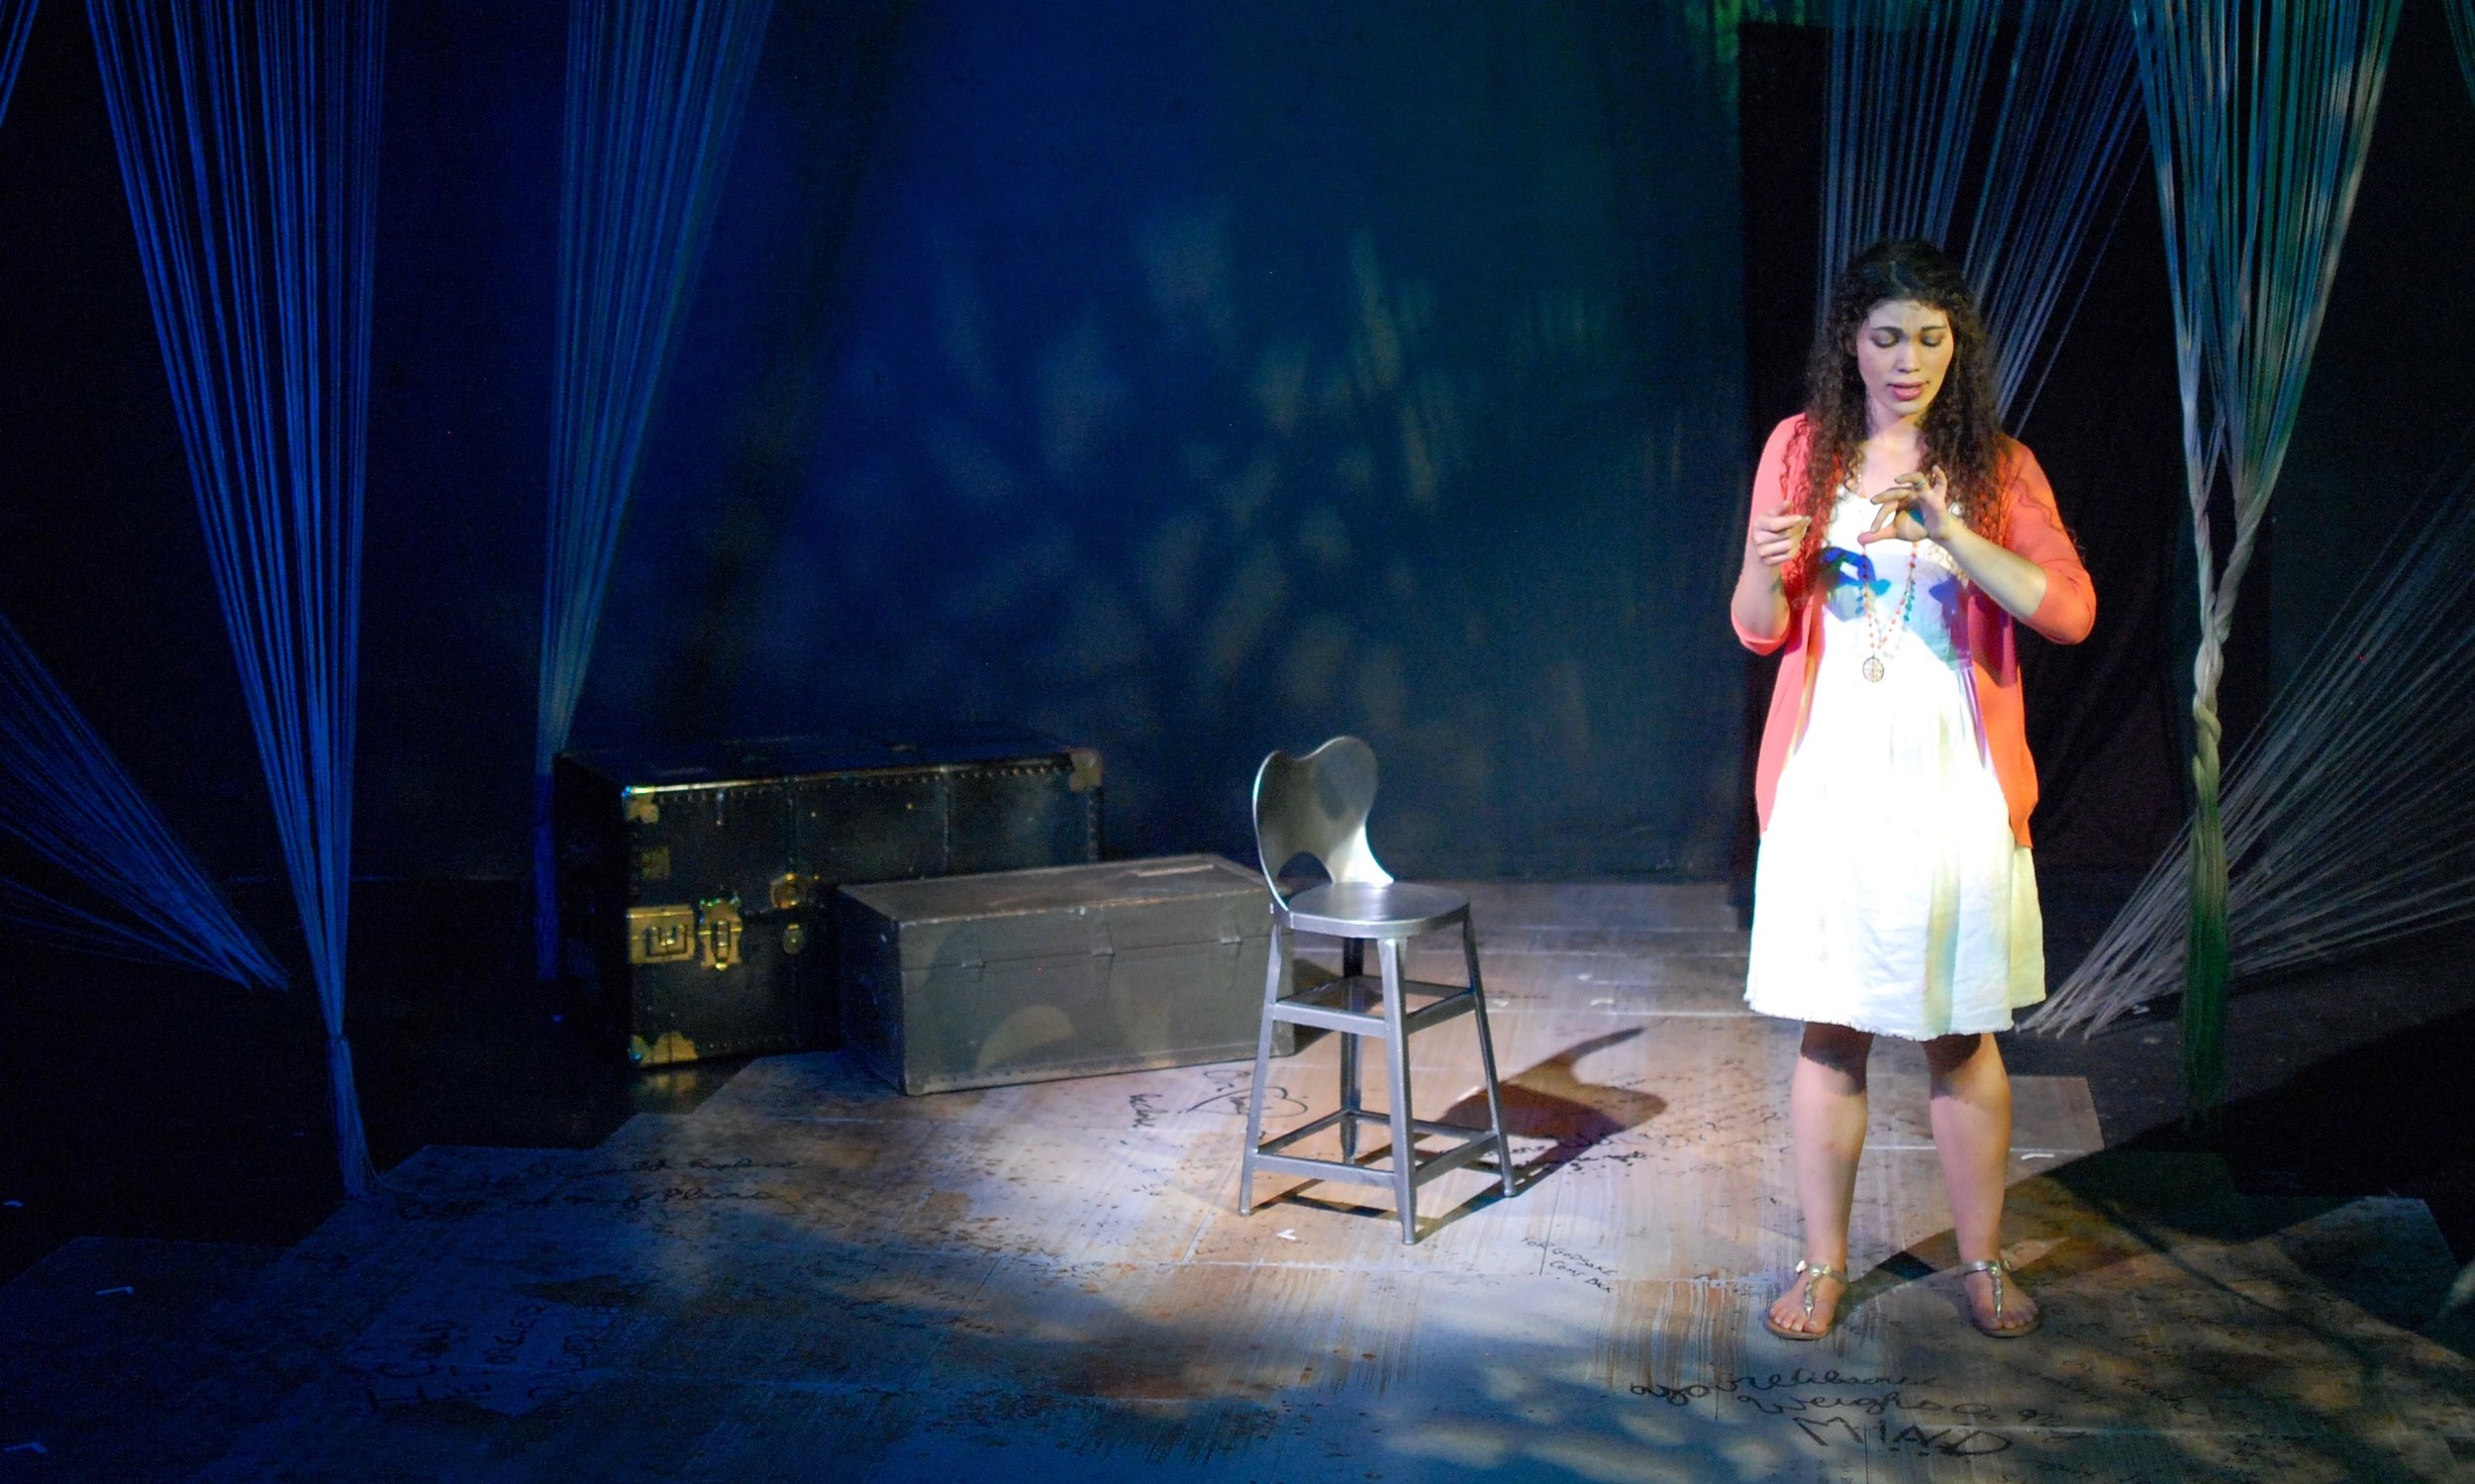 Eurydice contemplates marriage